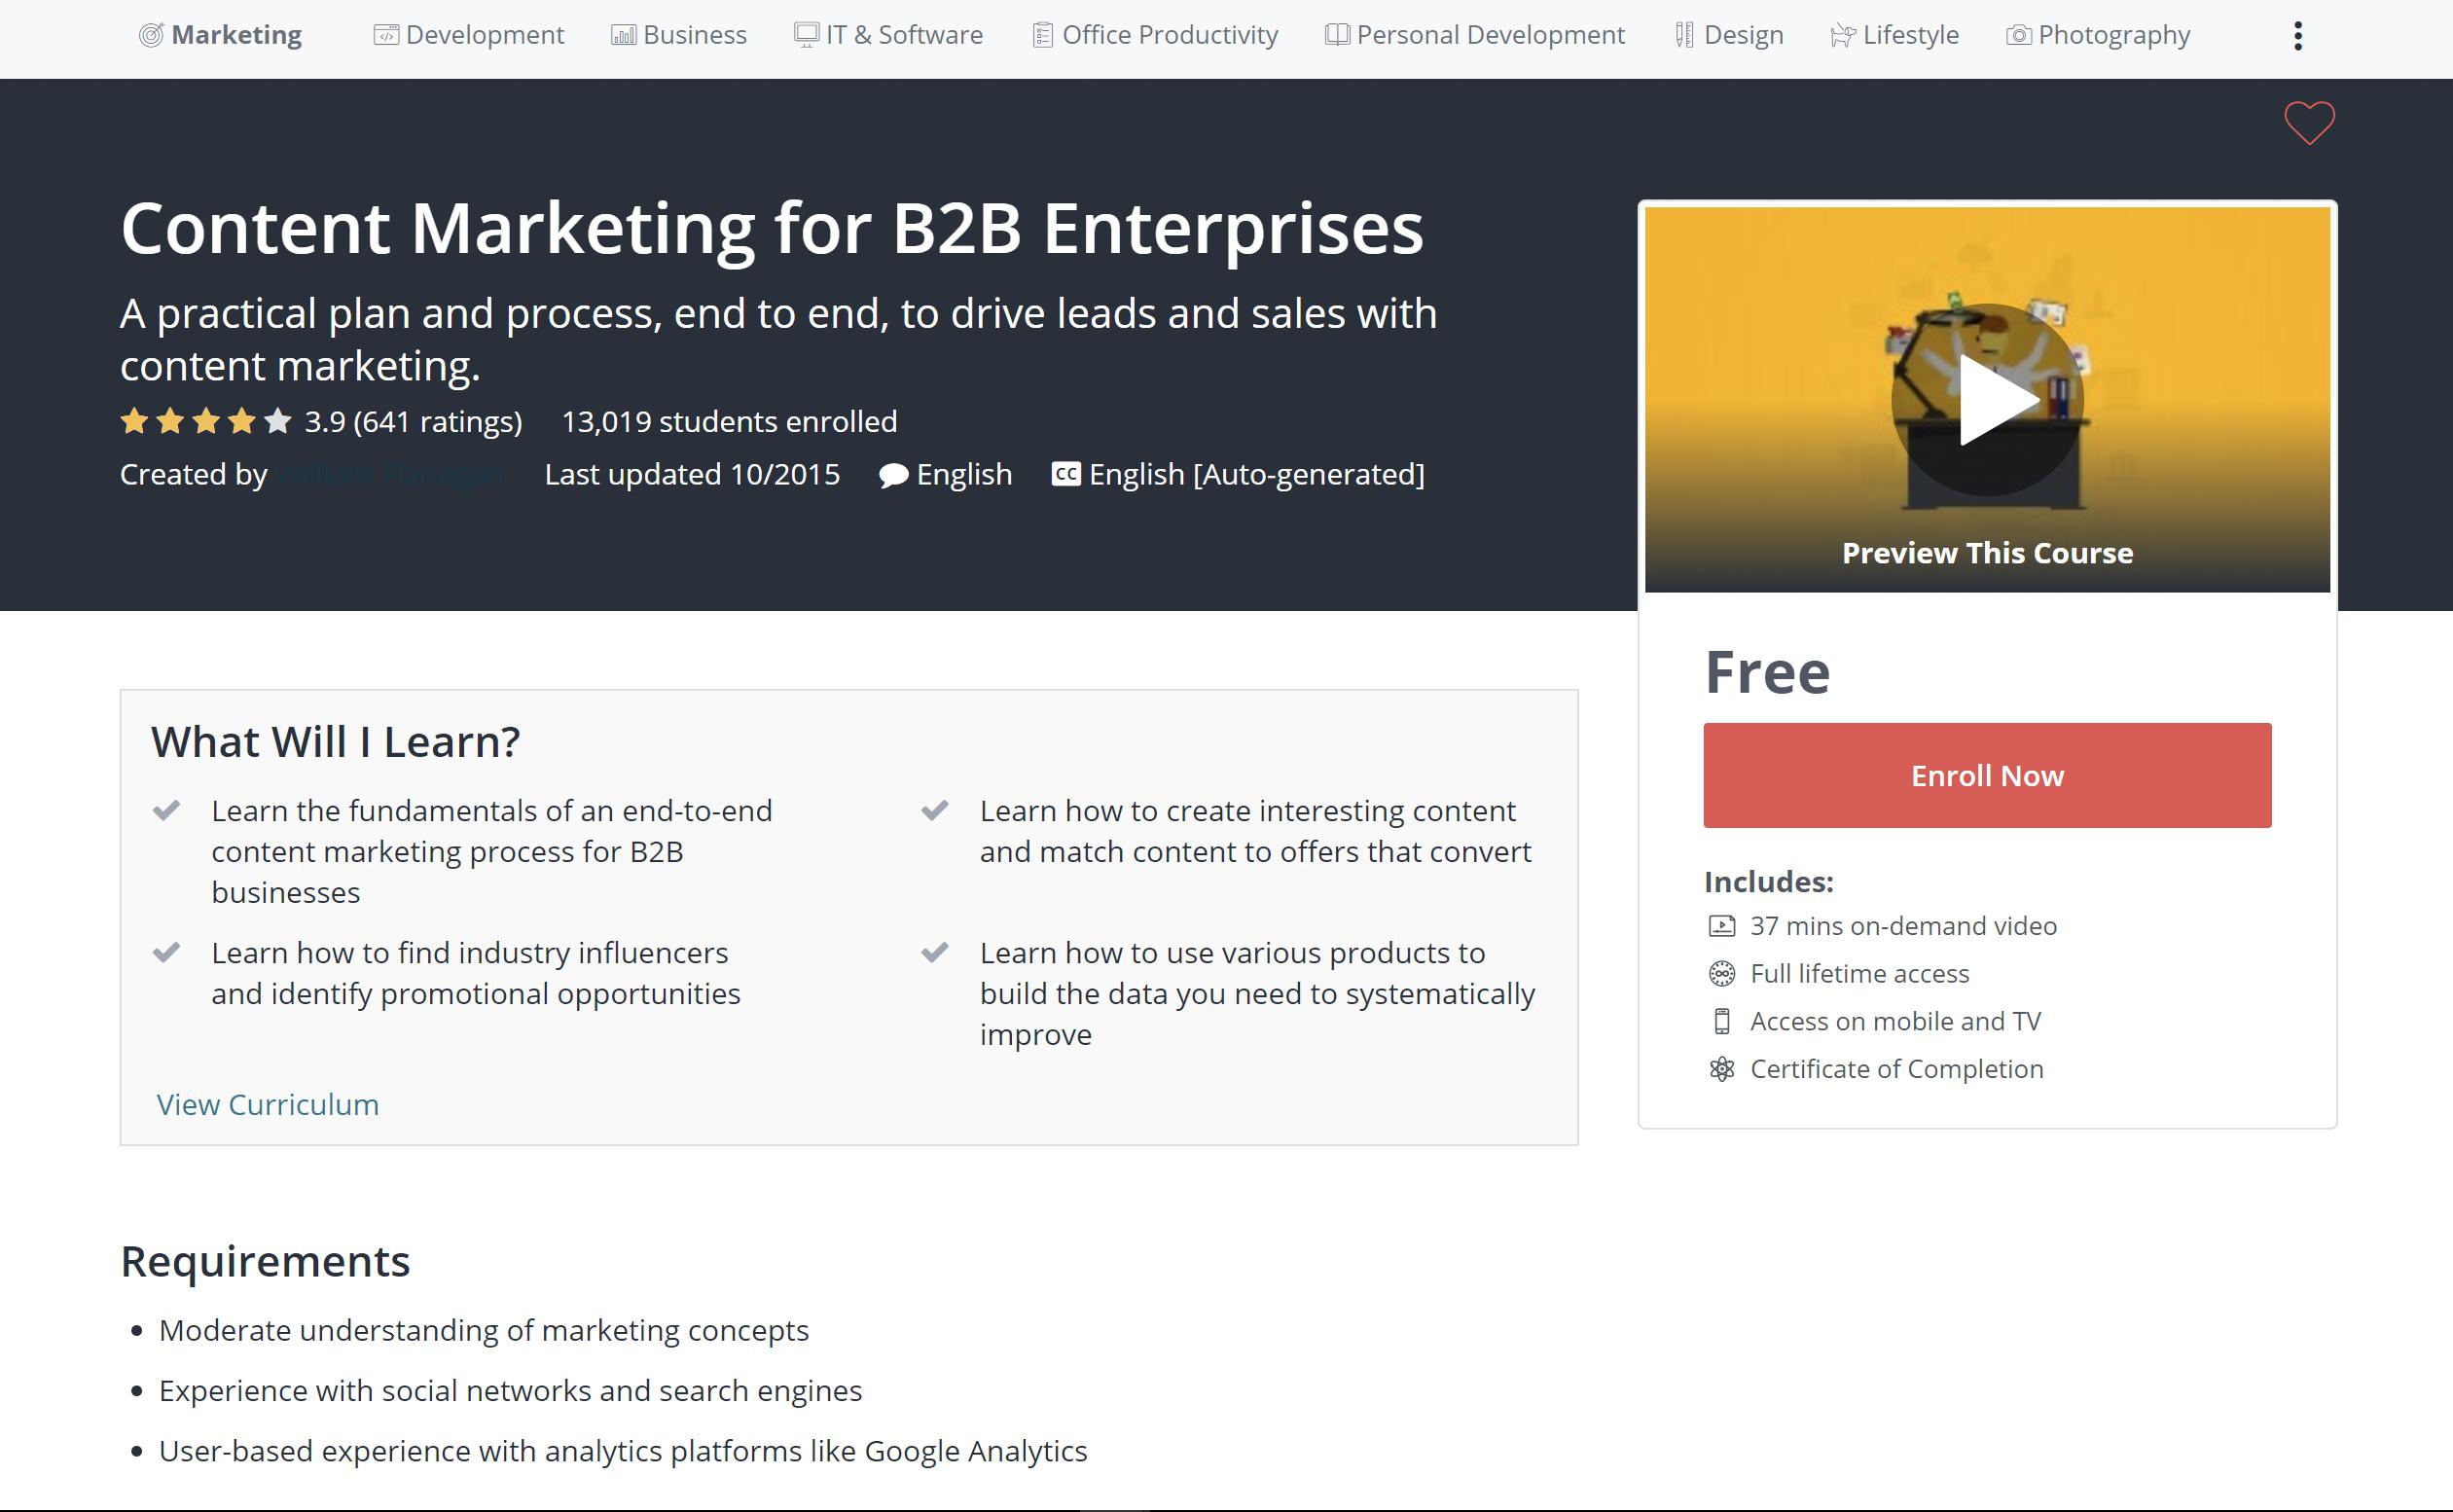 11 Free Digital Marketing Courses To Make You A Marketing Rockstar